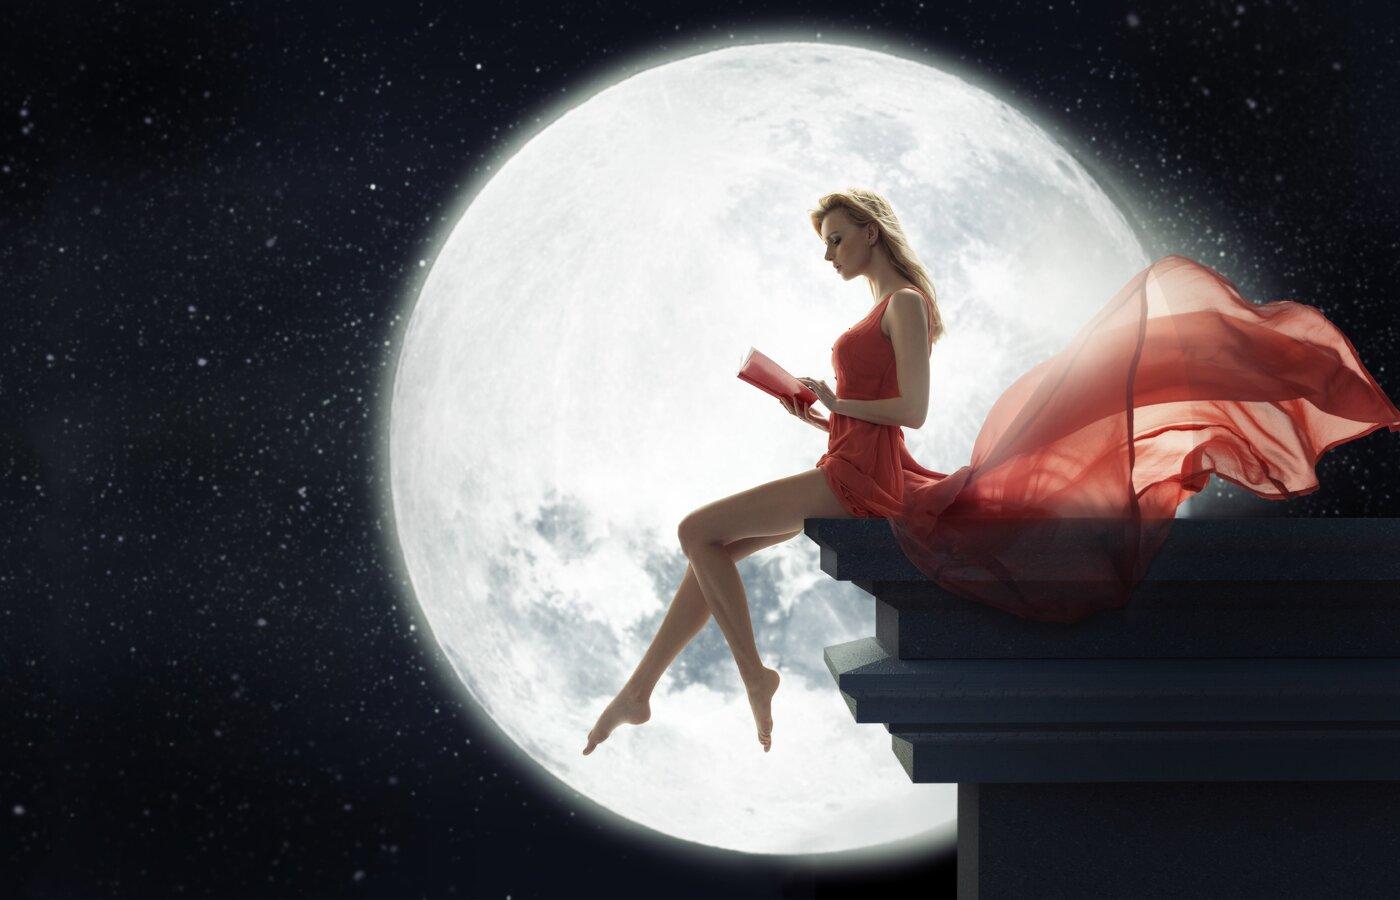 fantasy-girl-sitting-on-roof-reading-book-moon-j9.jpg